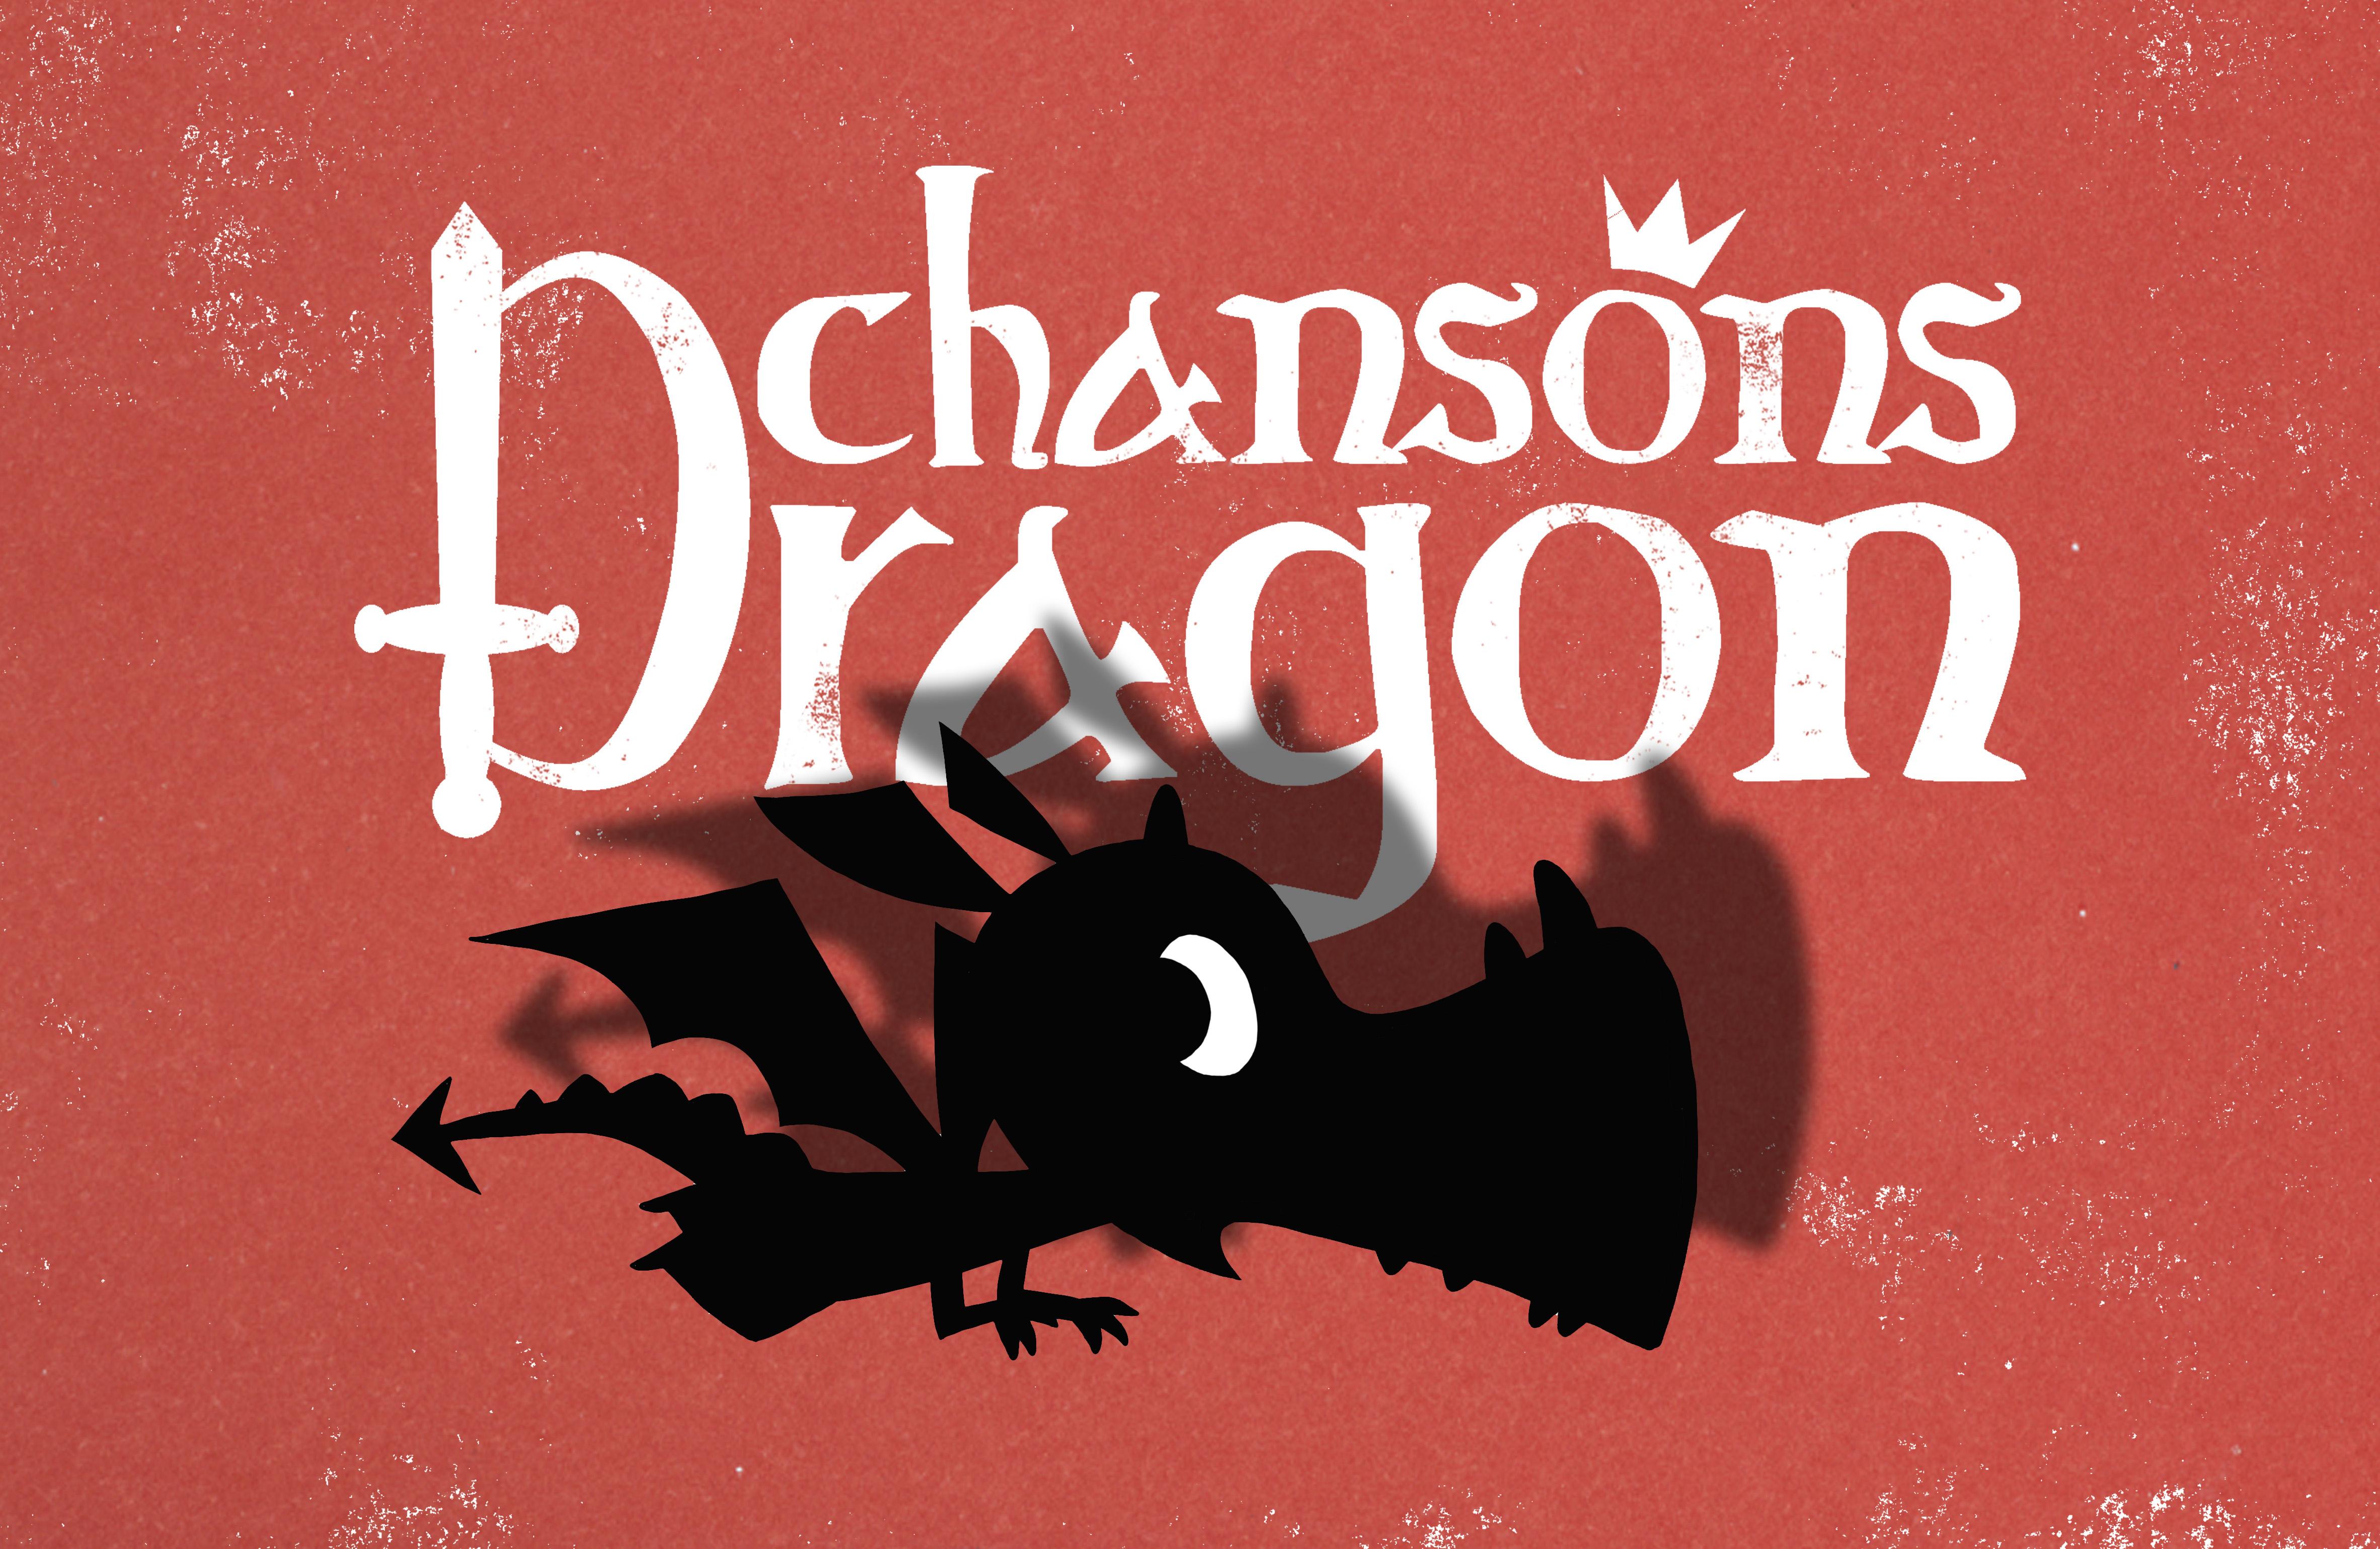 Chansons Dragon - Le Studio Fantôme tout Chanson De La Patate